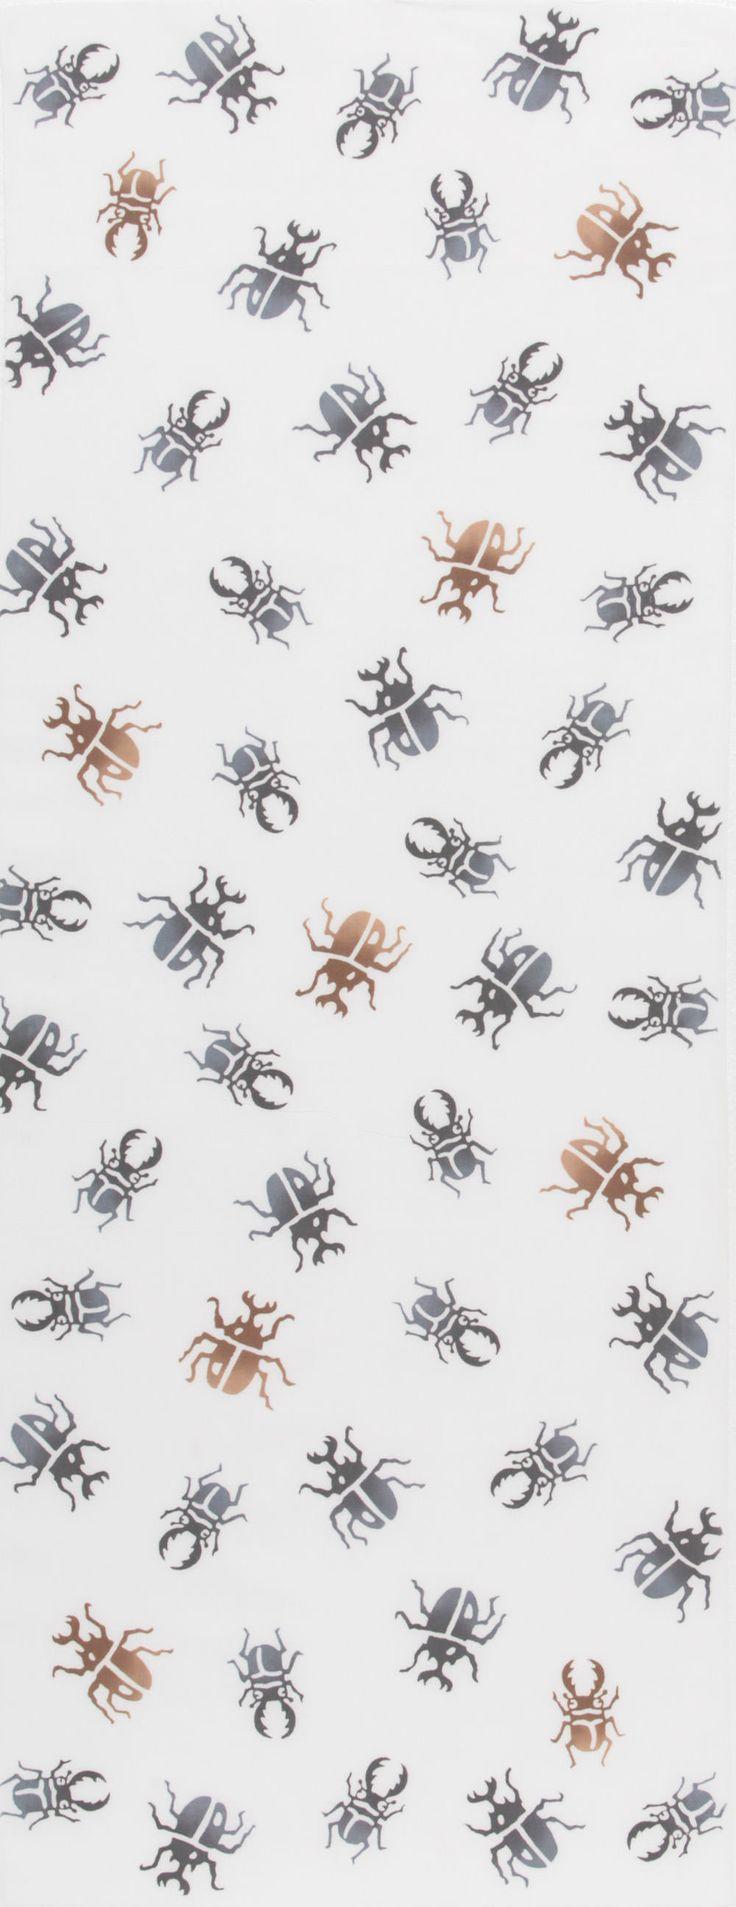 Japanese washcloth, Tenugui カブトムシ beetles